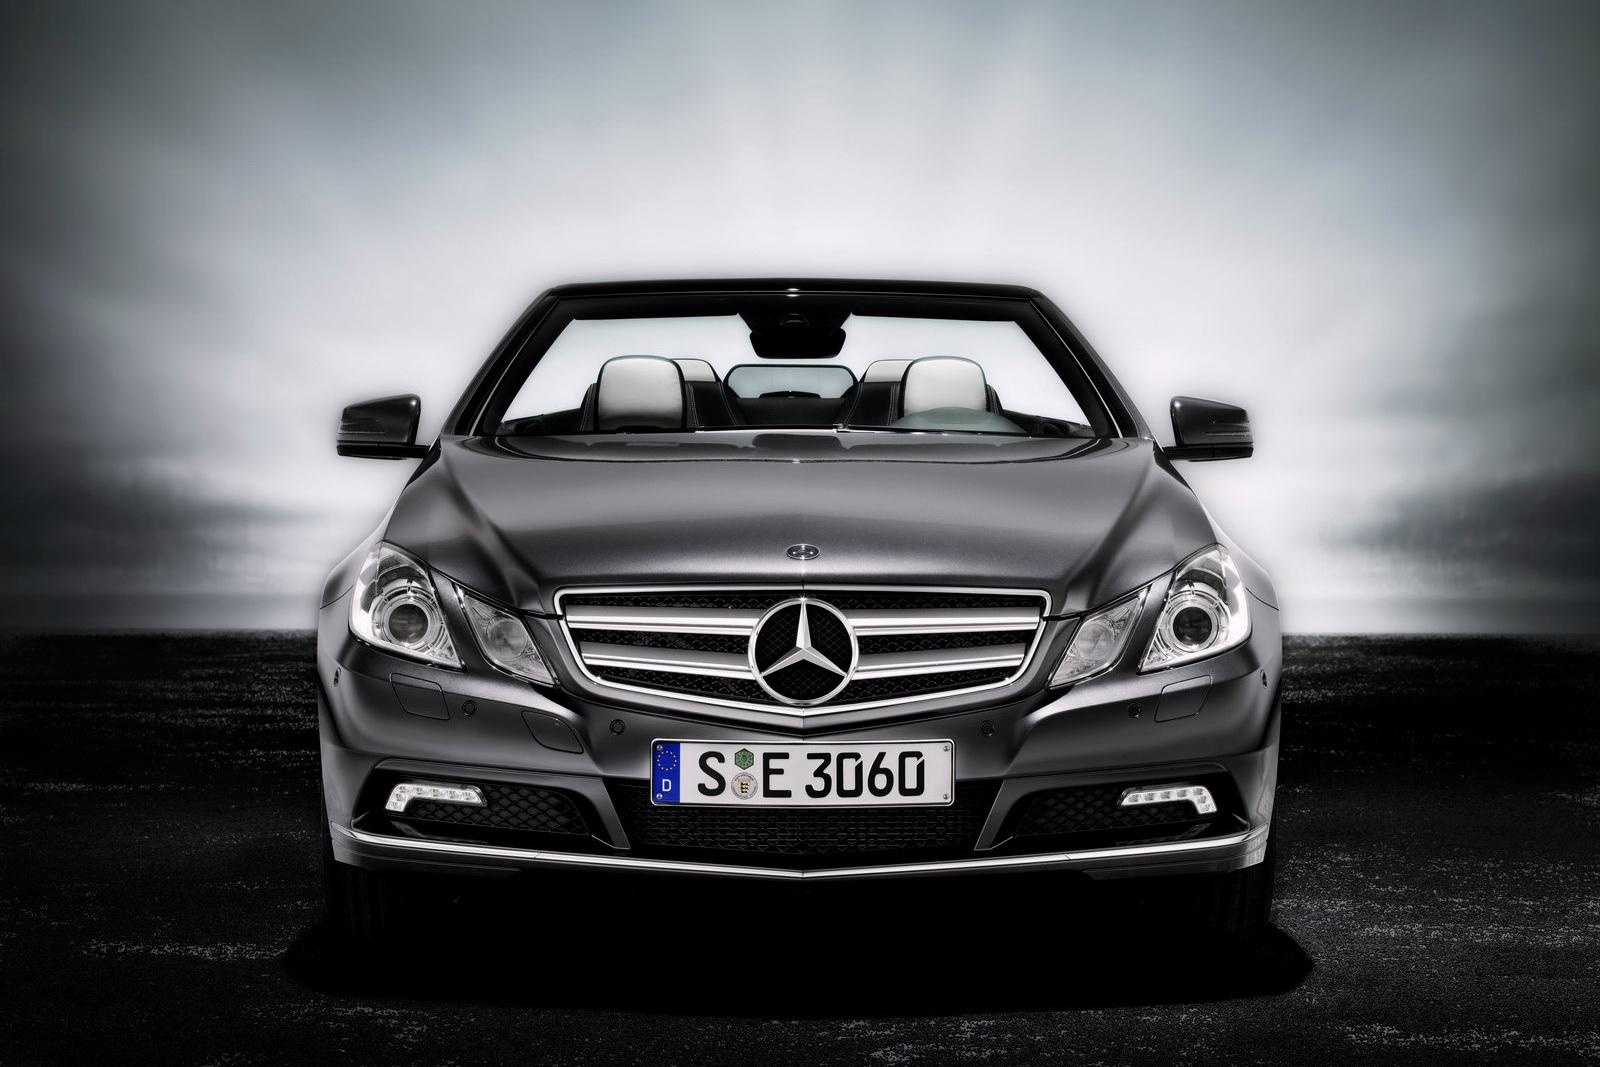 Mercedes benz e class convertible wallpaper for Prime motor cars mercedes benz